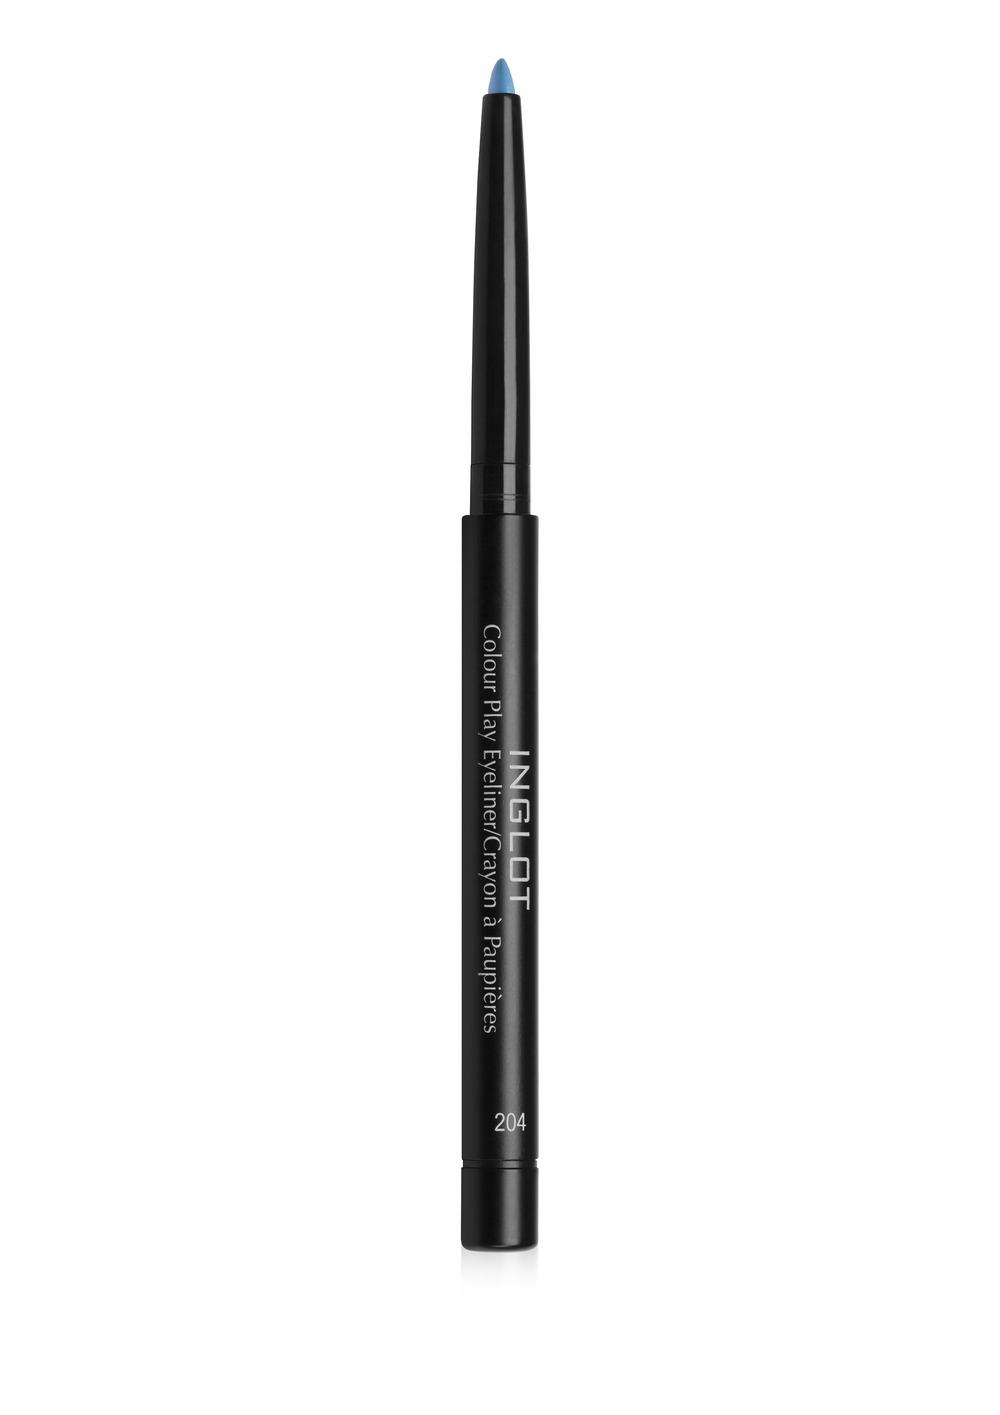 INGLOT Colourplay eyeliner 204.jpg